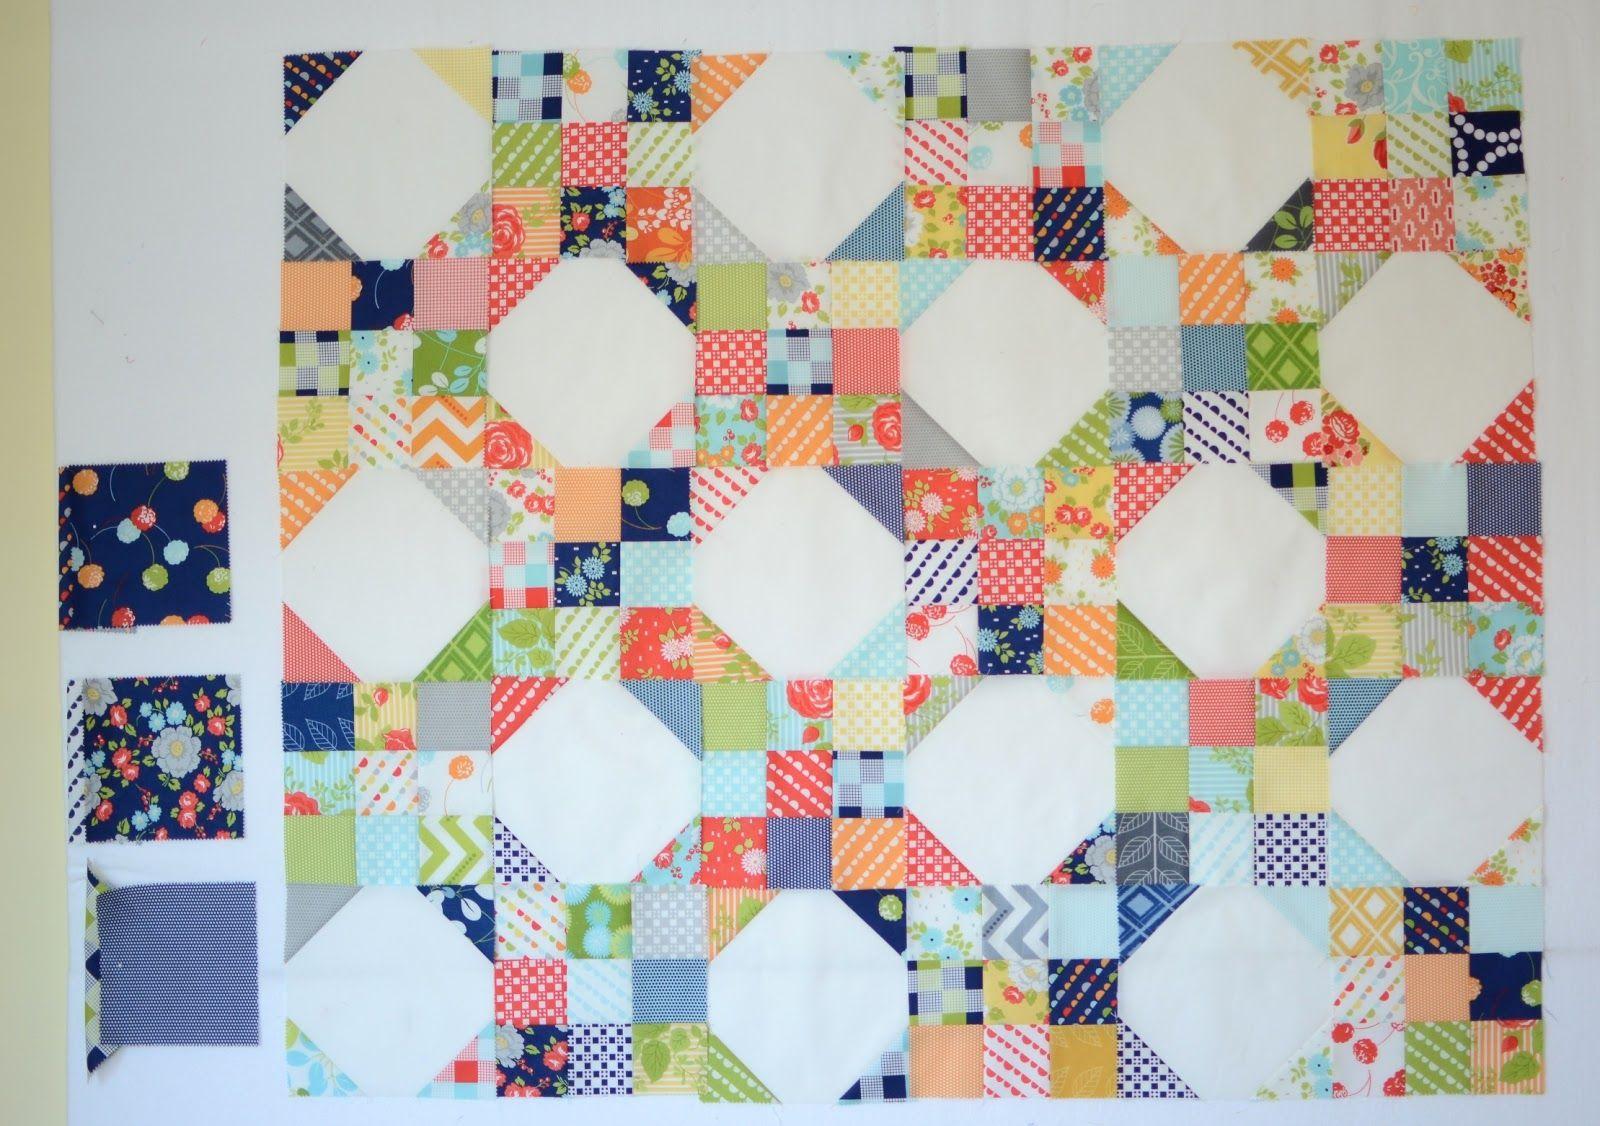 Hyacinth Quilt Designs: Nine-Patch/Snowball Quilt Tutorial - For ... : hyacinth quilt designs - Adamdwight.com